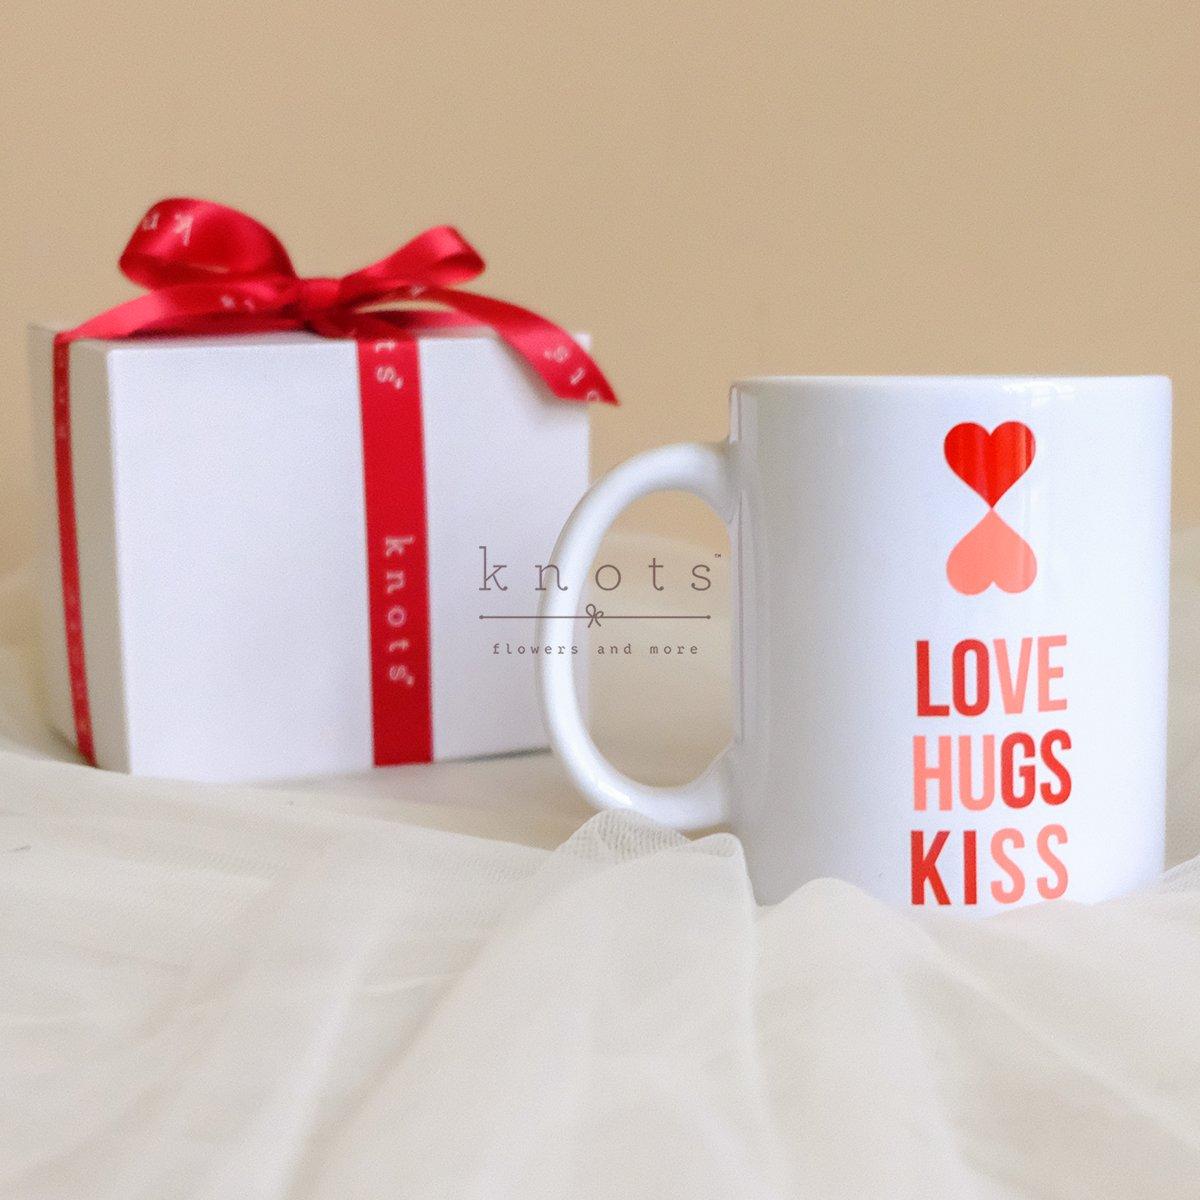 Love Hugs Kiss